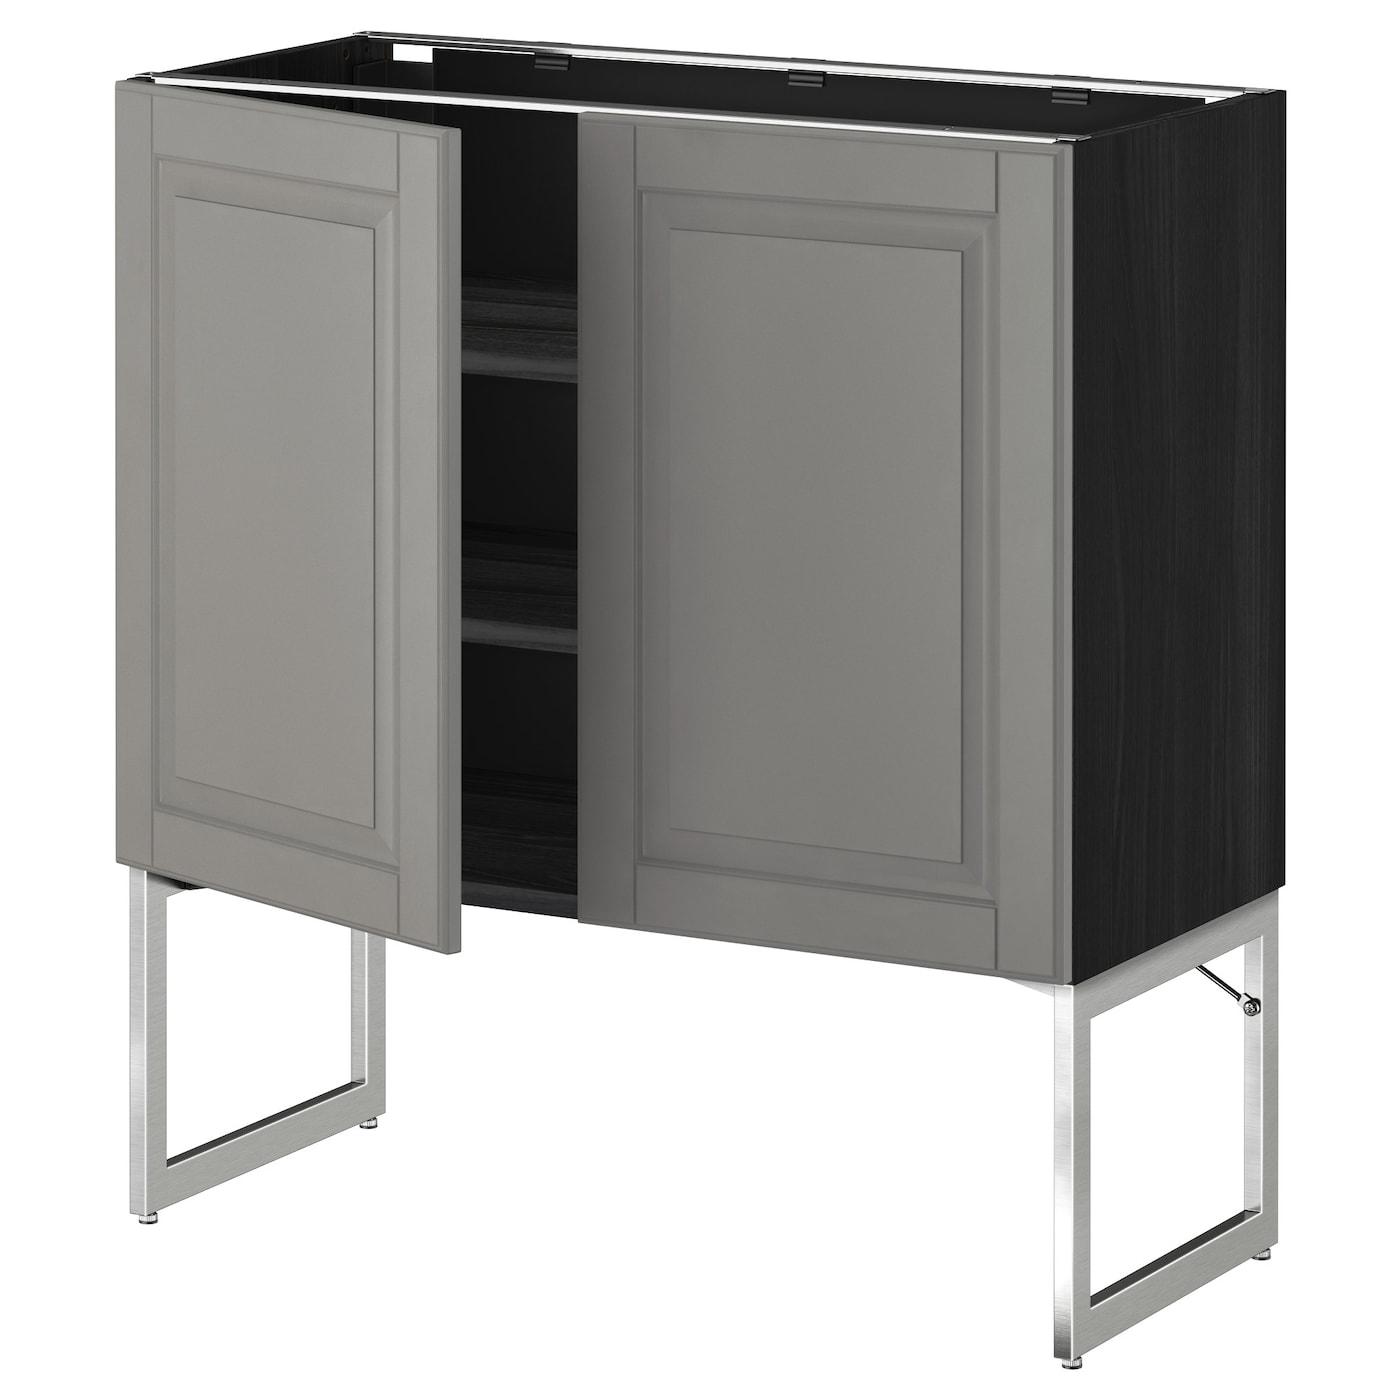 METOD Base Cabinet With Shelves/2 Doors Black/bodbyn Grey 80x37x60 Cm